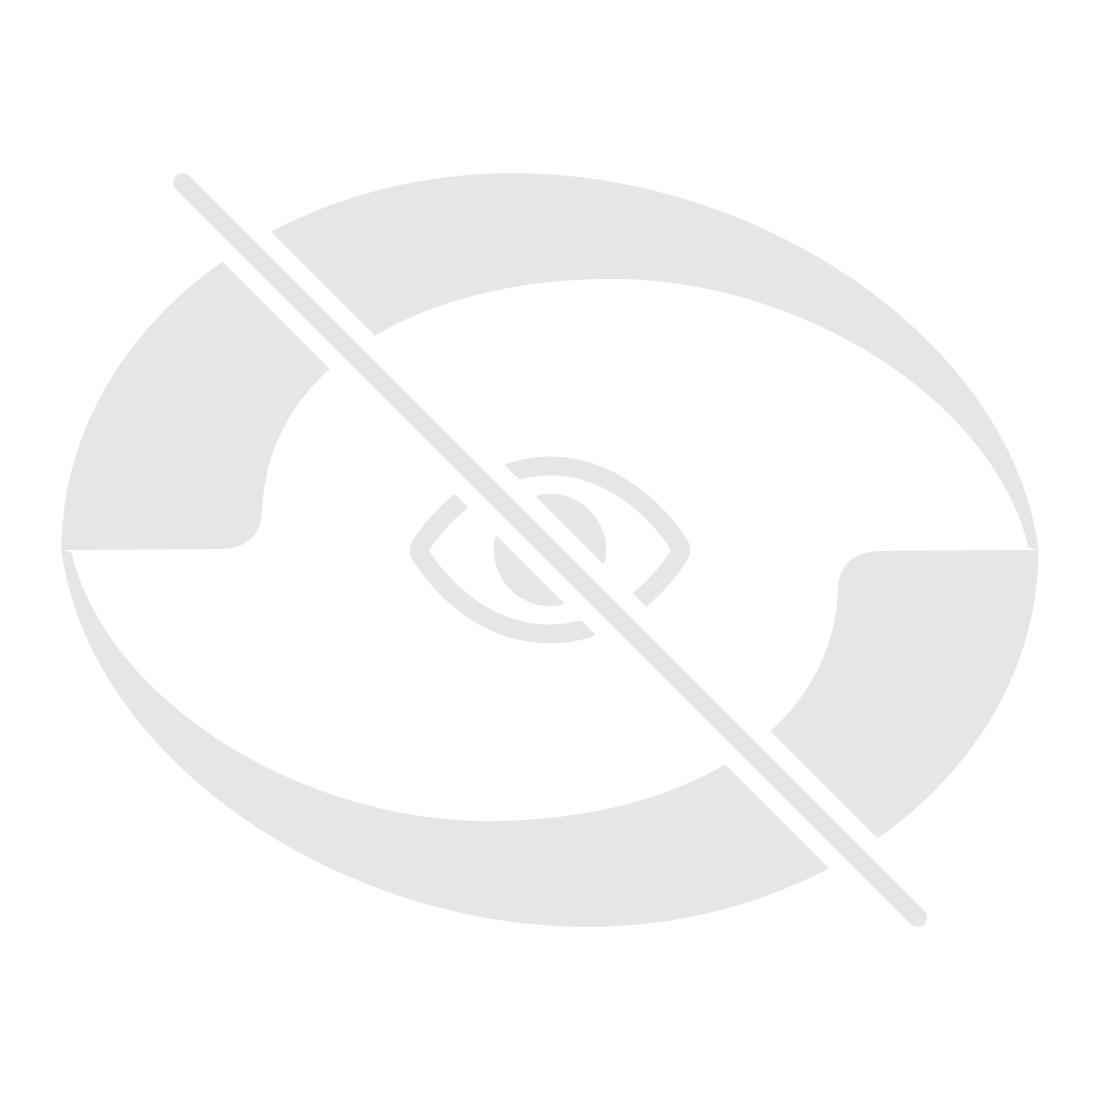 GeoVision GV-650B-08 • 8 channel hybrid video capture card